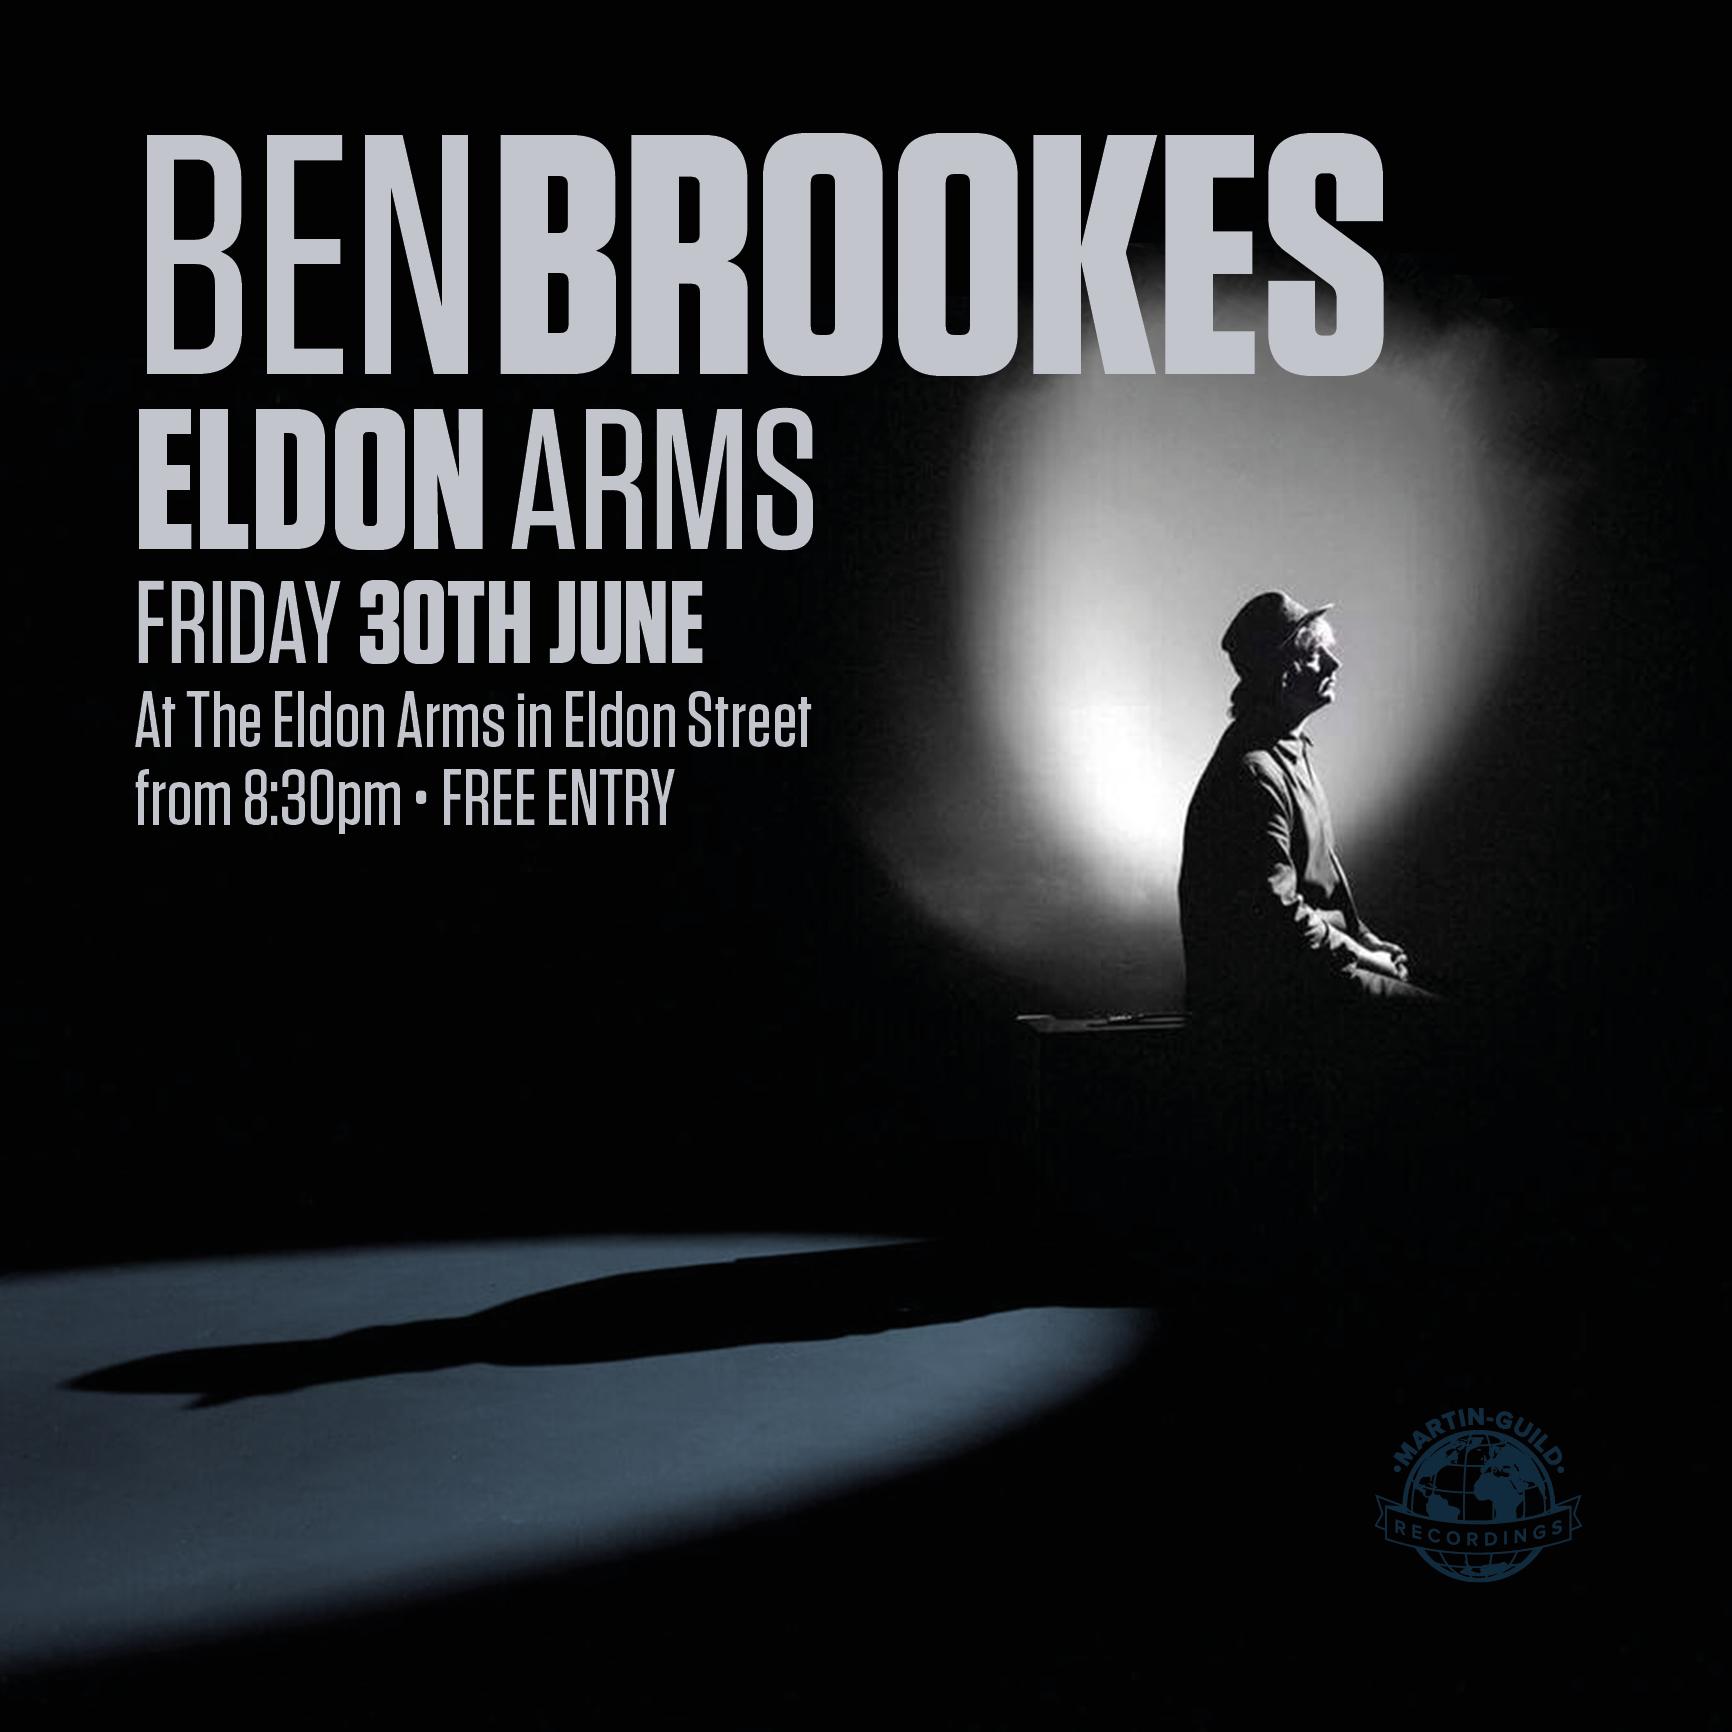 Ben Brookes Poster for Eldon Arms Square.jpg